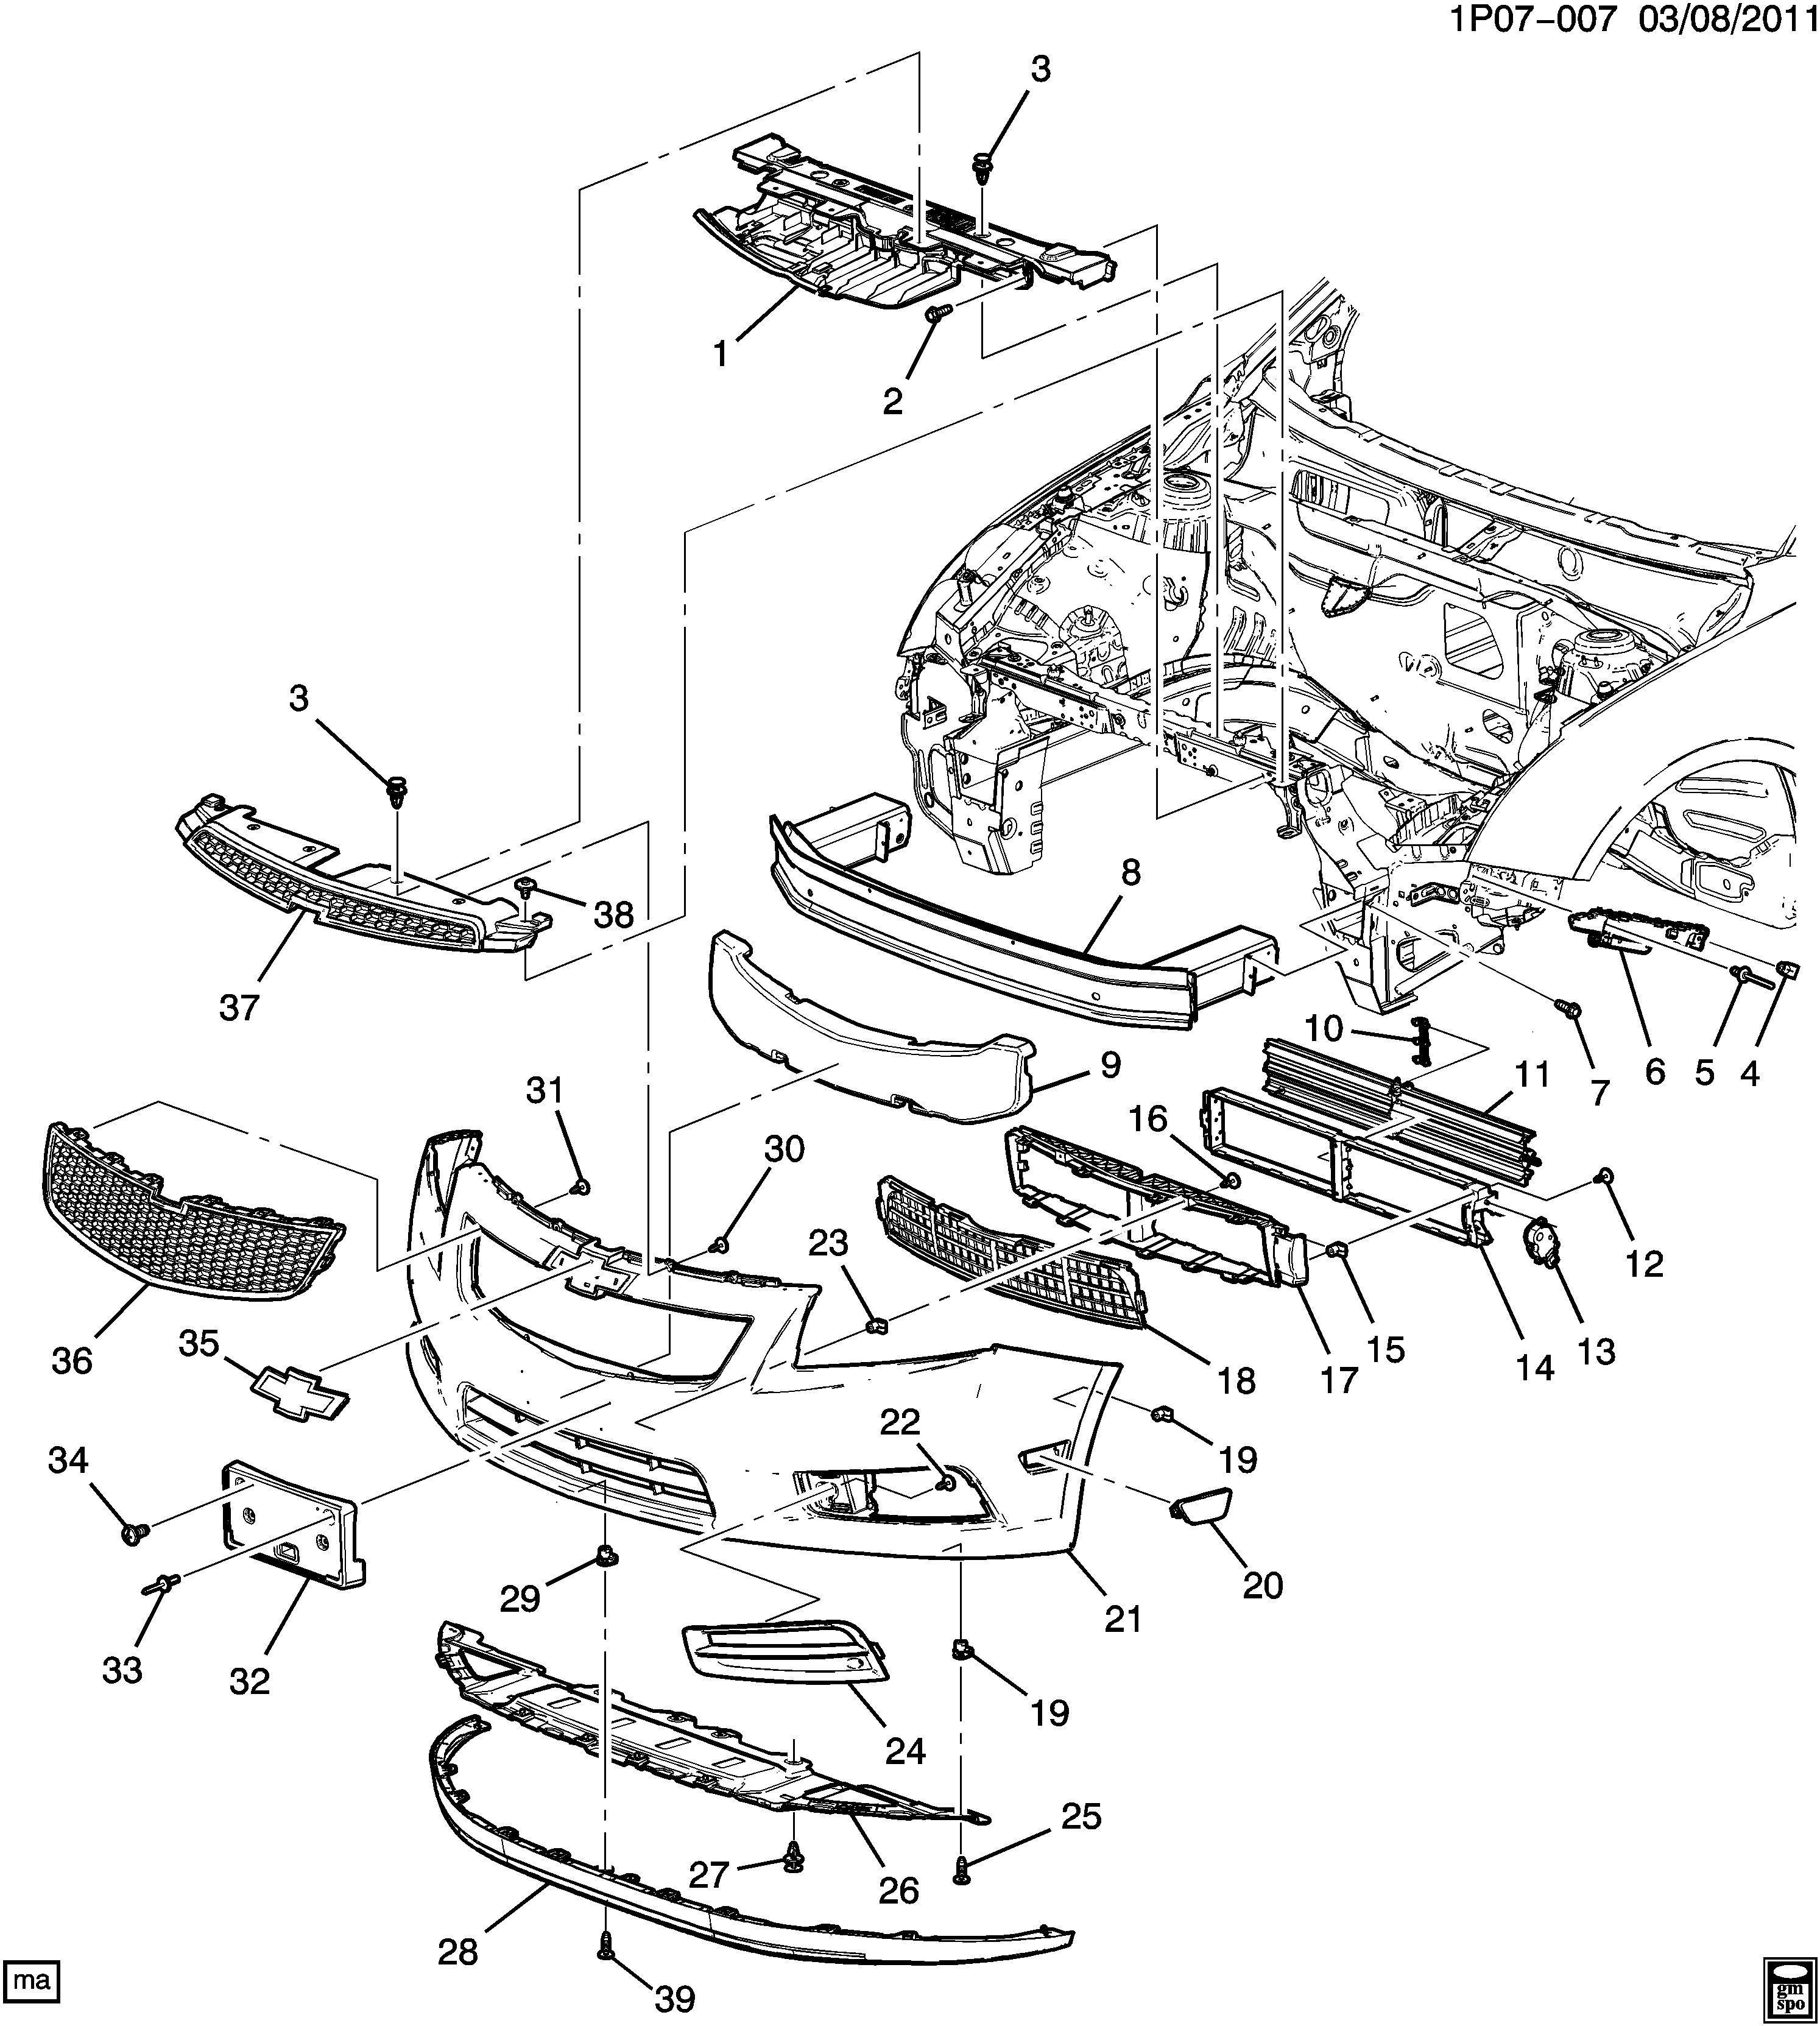 34 Chevy Cruze Parts Diagram